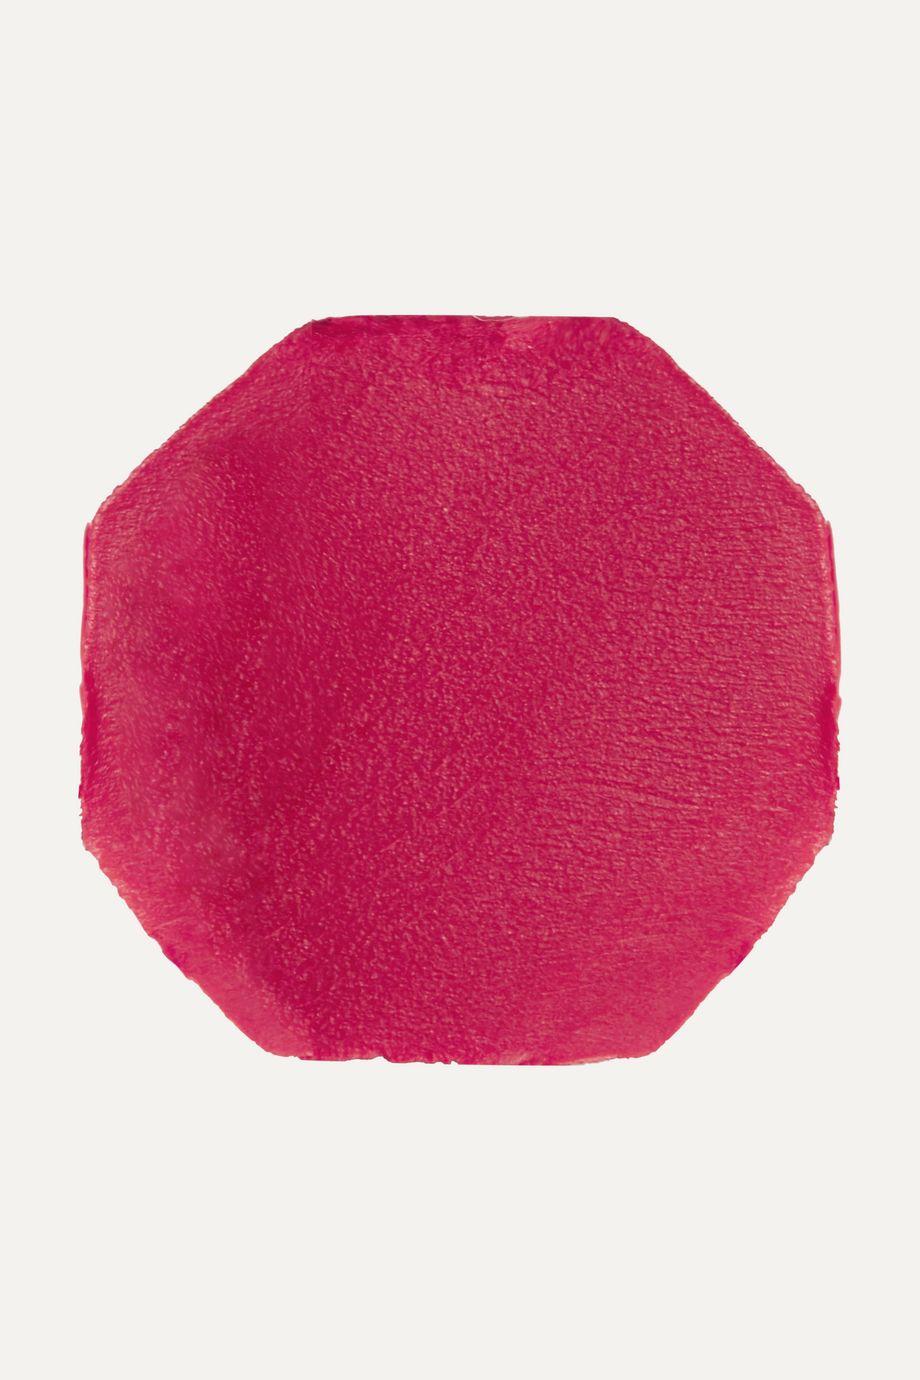 Sisley Le Phyto Rouge Lipstick - 23 Rose Delhi